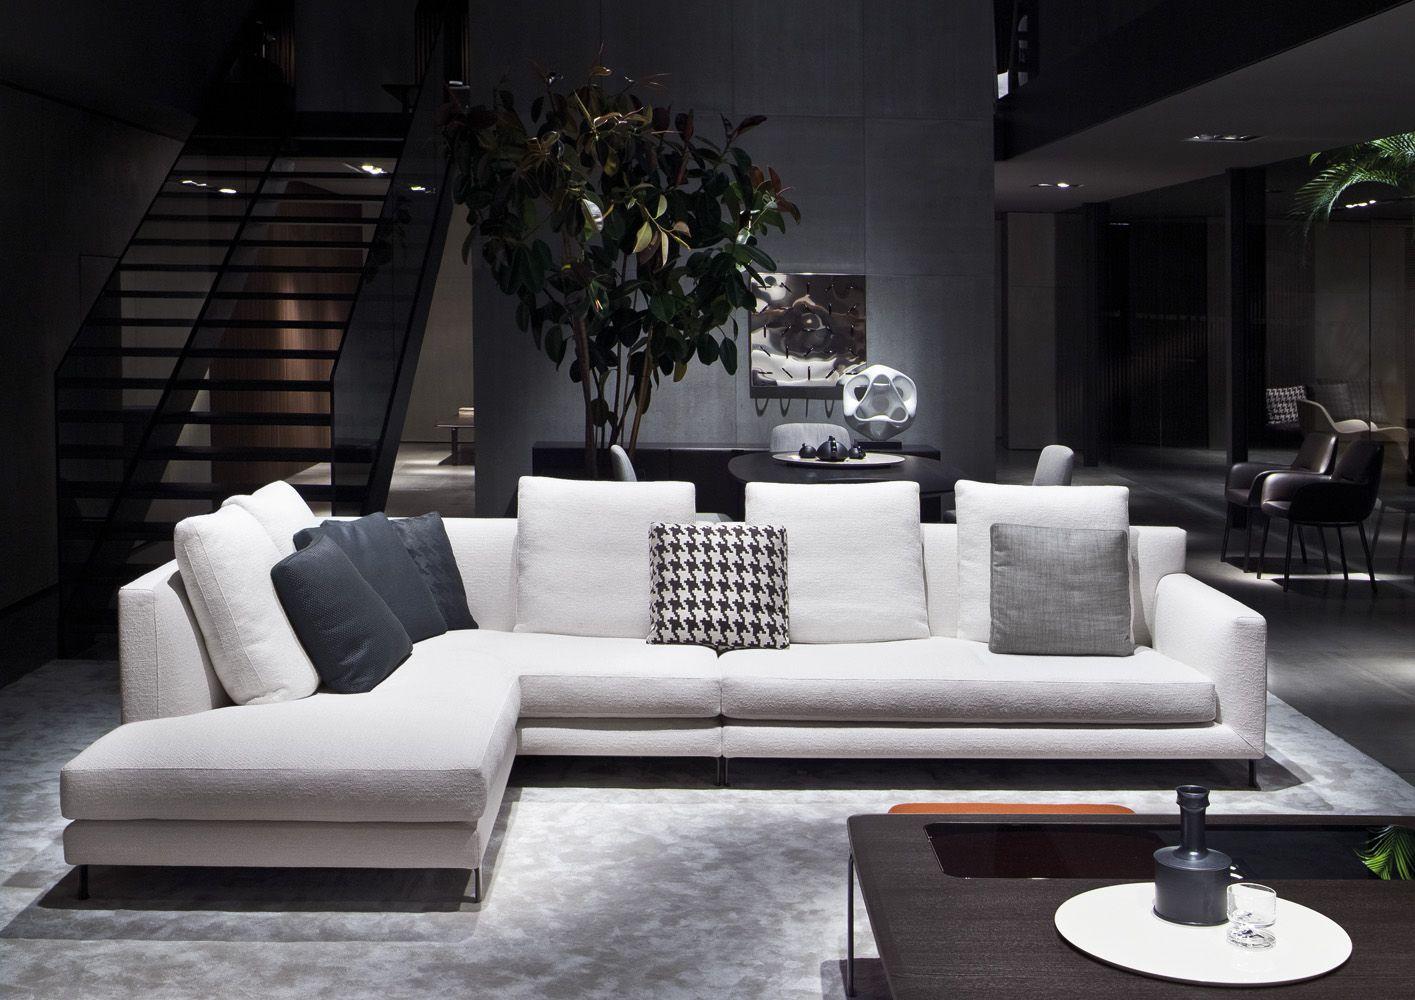 Minotti Sofas Australia Home Styles Modern Craftsman Sofa Table Ipad En Allen Mobilier Pinterest